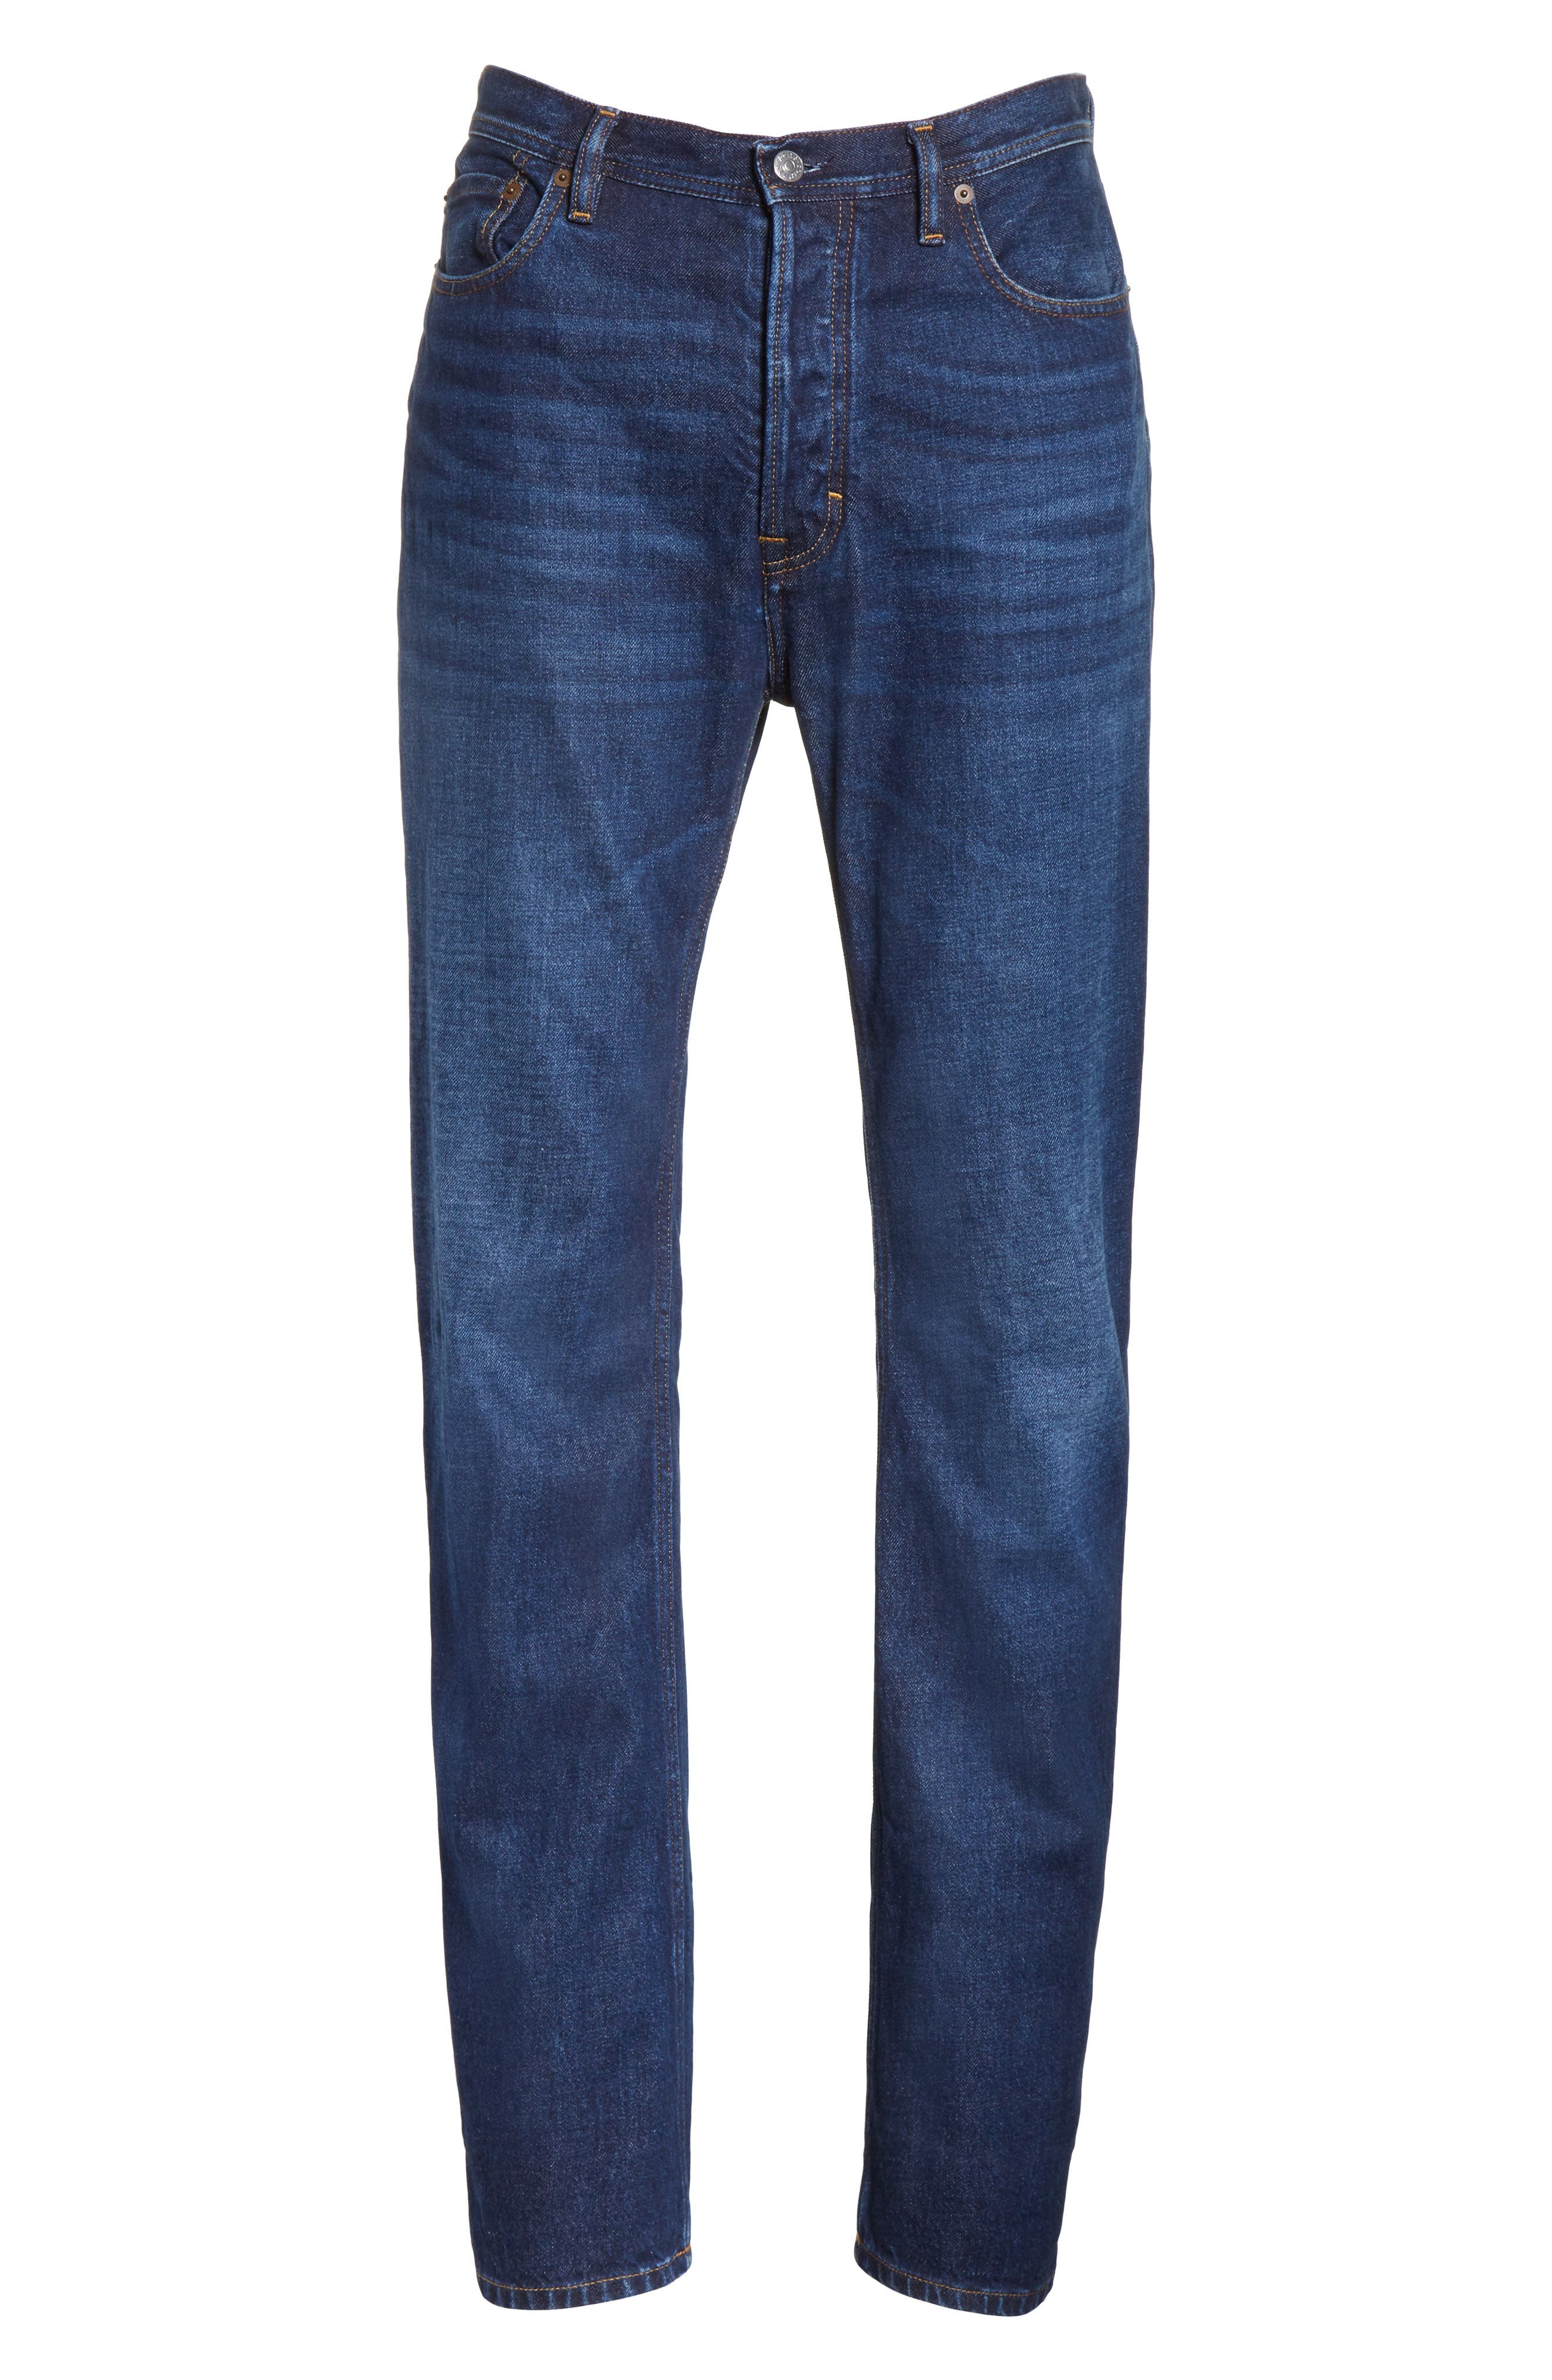 Land Classic Straight Leg Jeans,                             Alternate thumbnail 6, color,                             123 Dk Blue